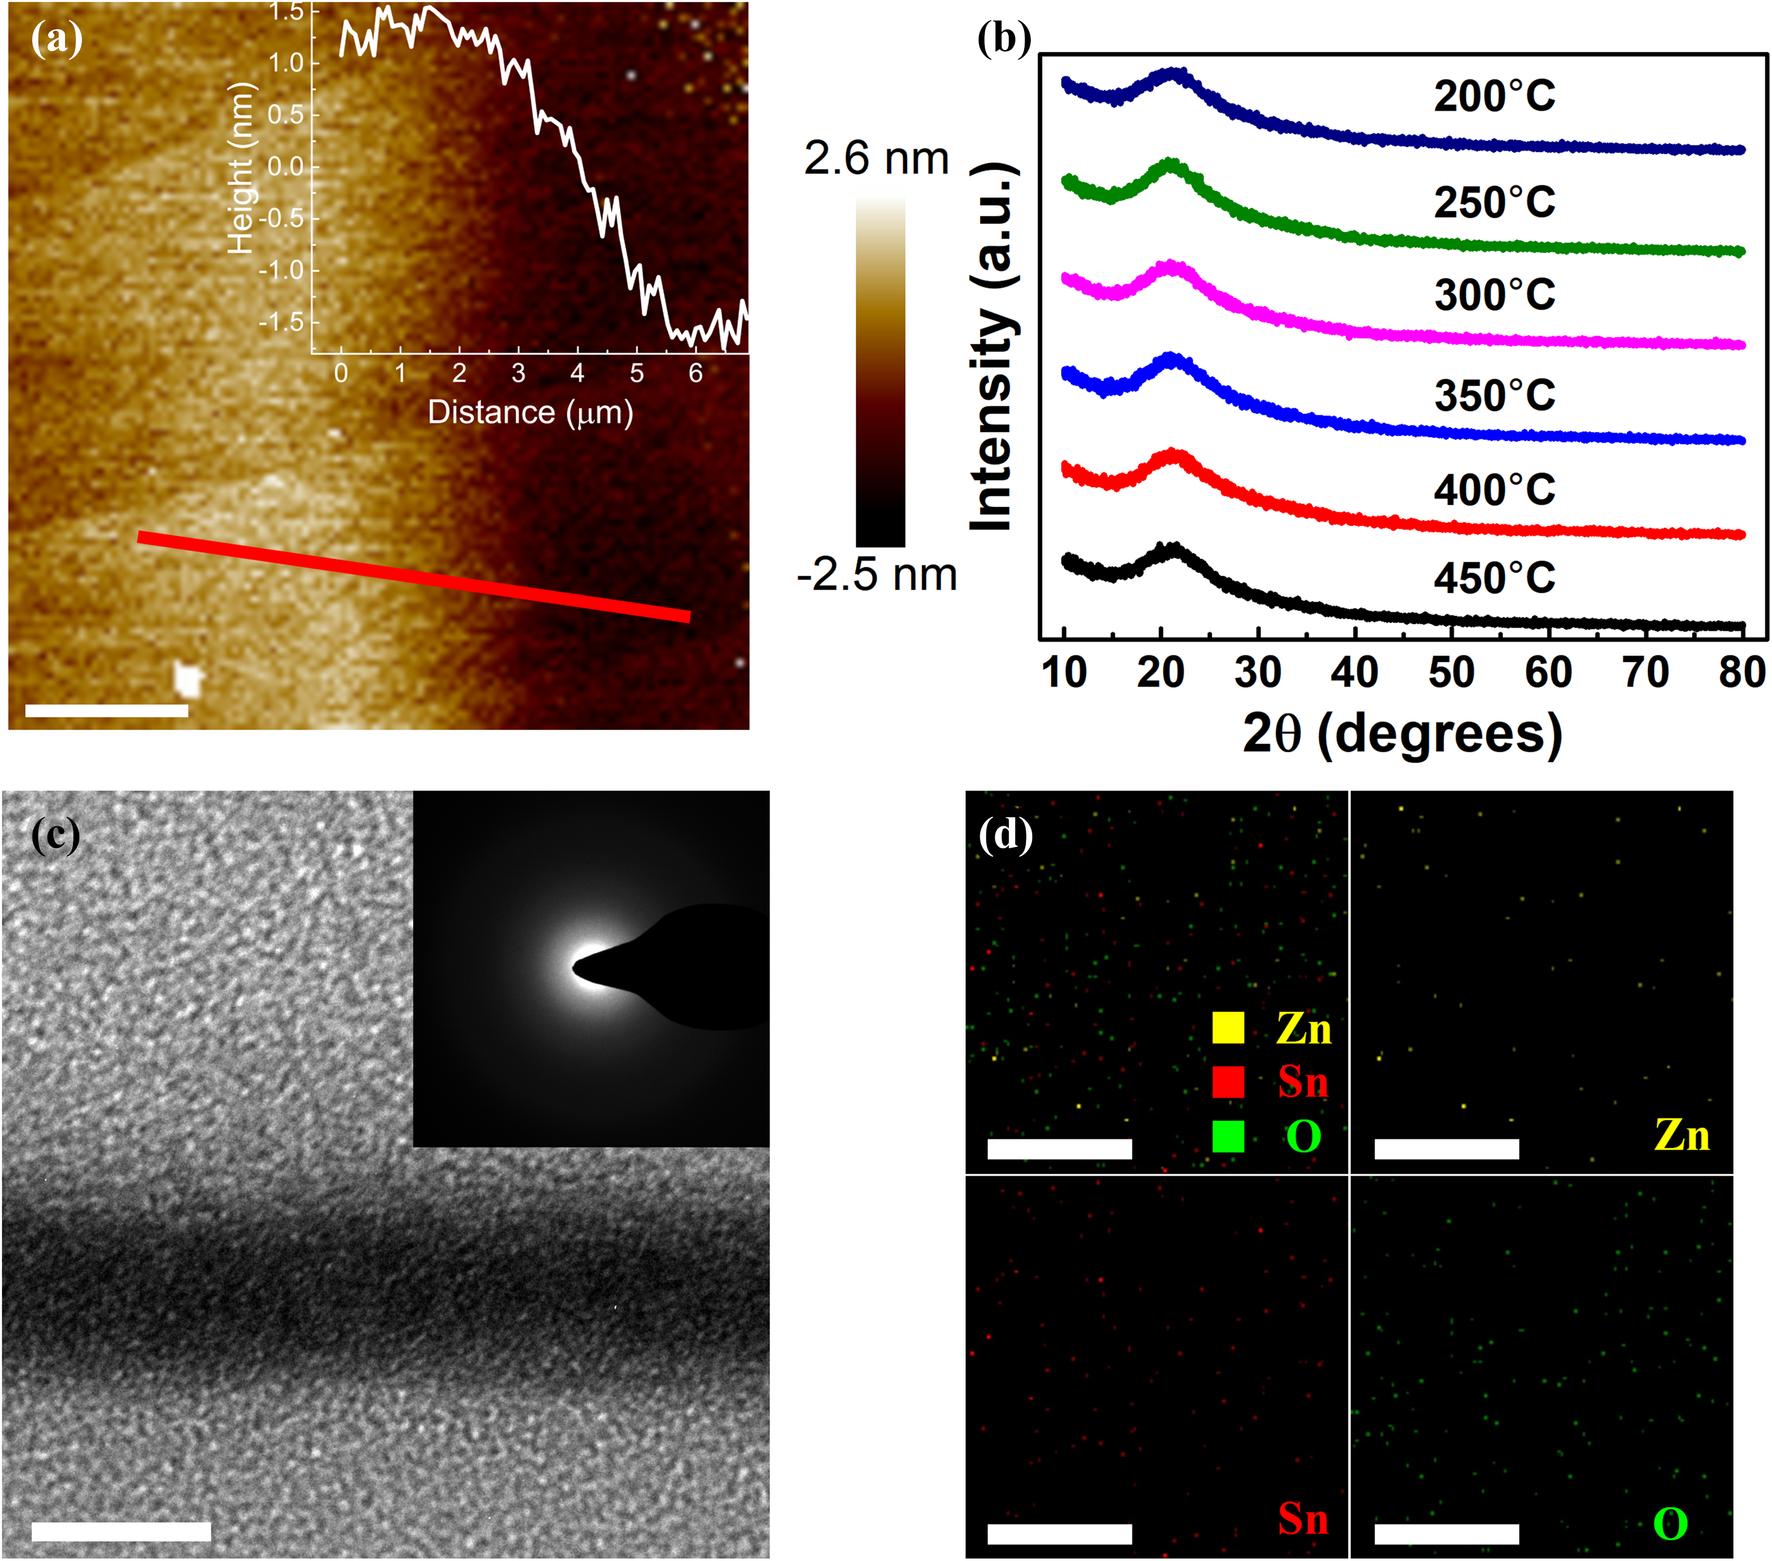 Ultra-thin-film transistors based on ultra-thin amorphous